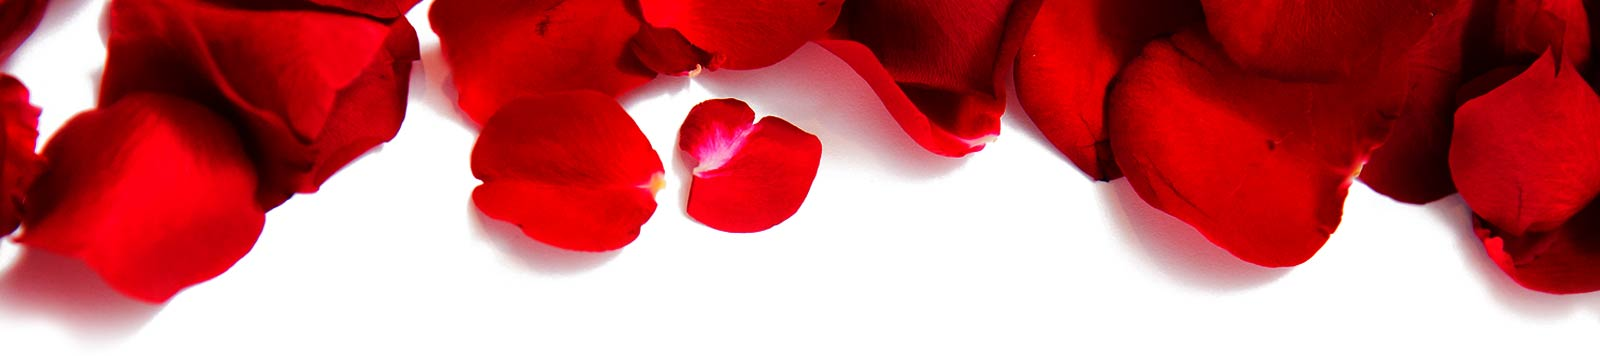 Rose petals ready at the table